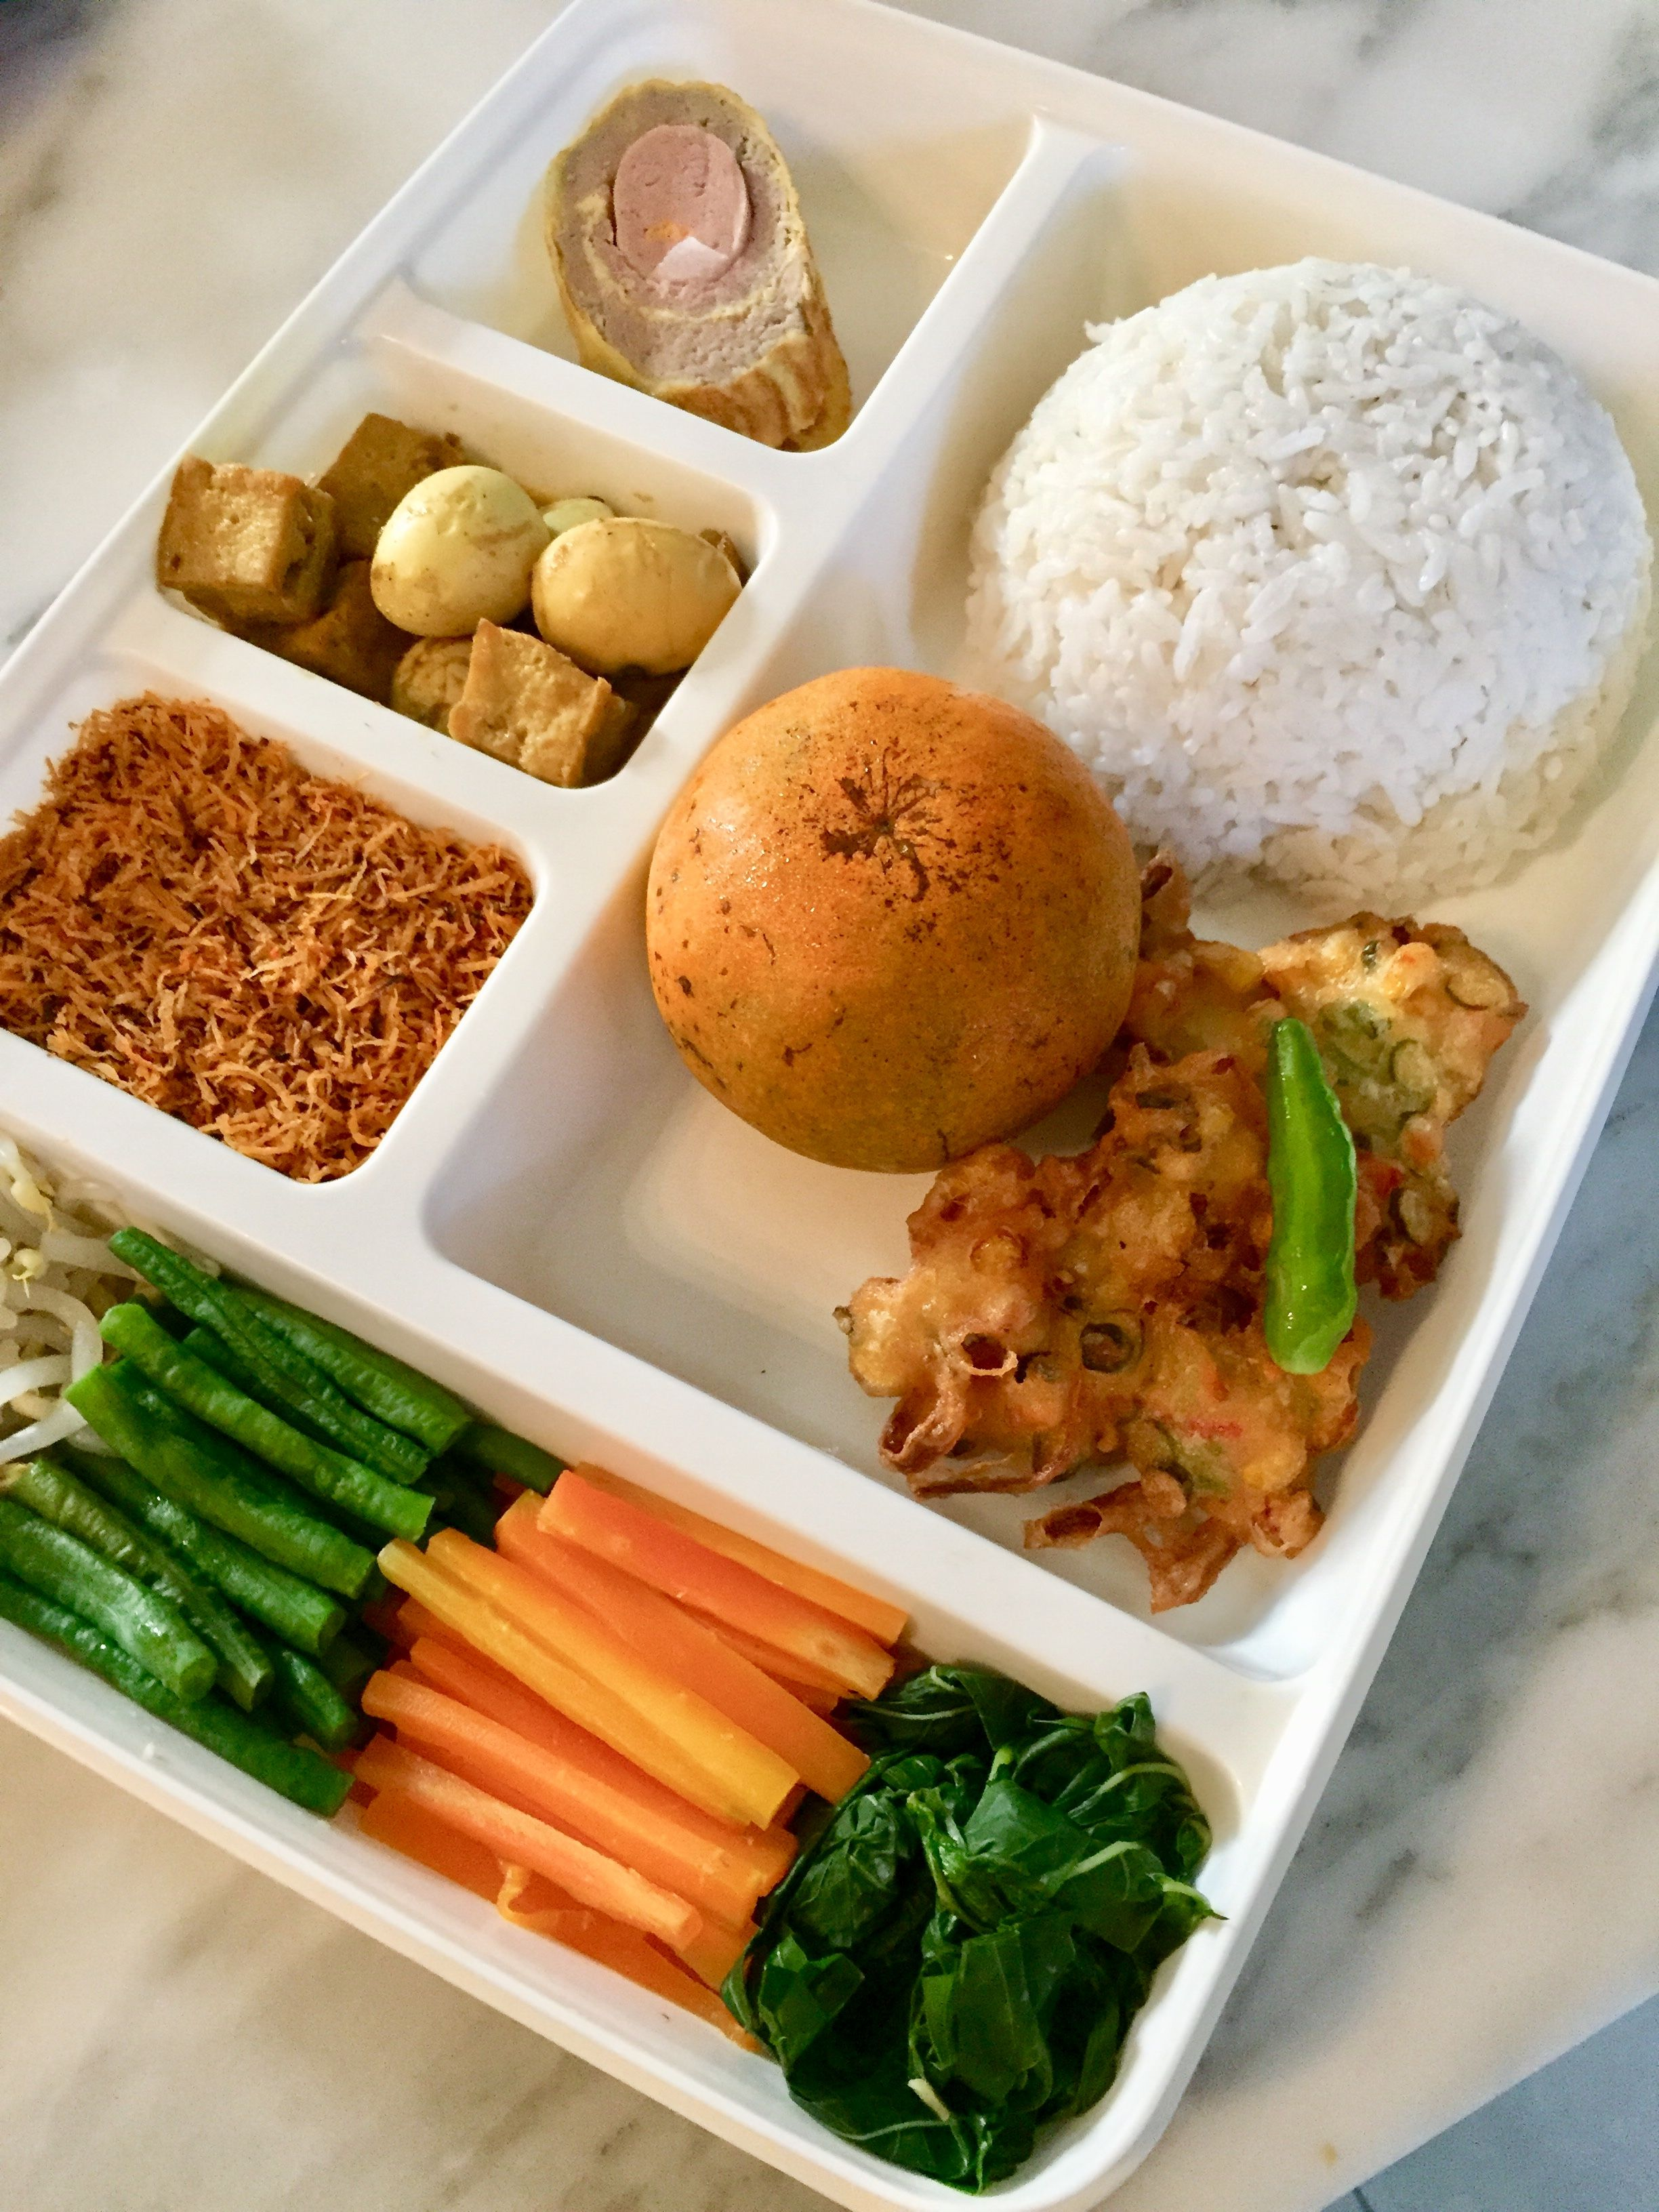 Pin Oleh Kania Di Catering Ideal Ide Makanan Makanan Dan Minuman Resep Sushi